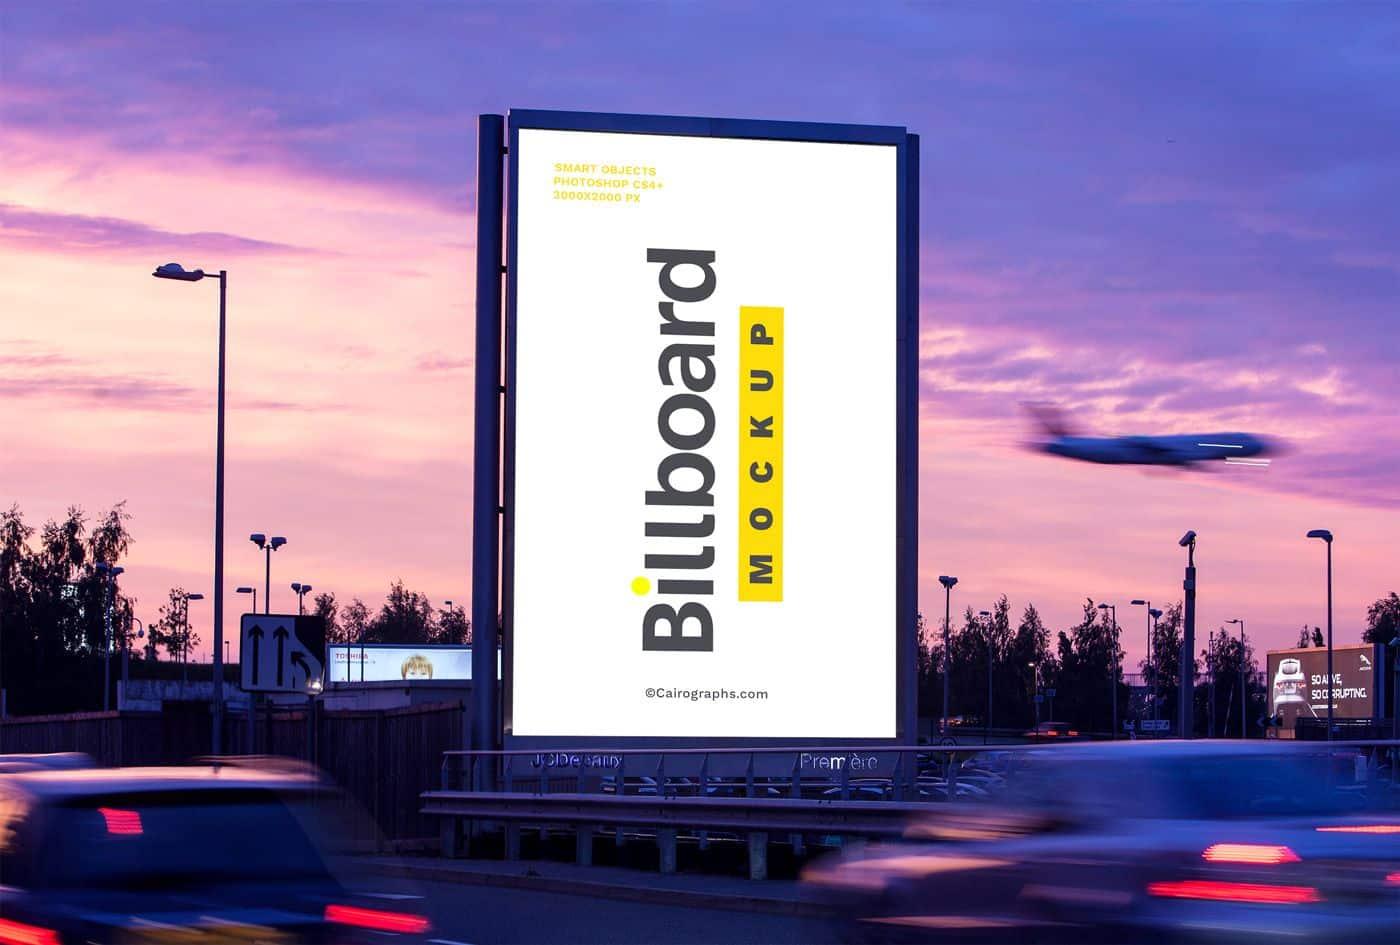 Billboards Vol.2 Product Mockup #76182 - TemplateMonster | Billboard mockup, Billboard, Mockup templates